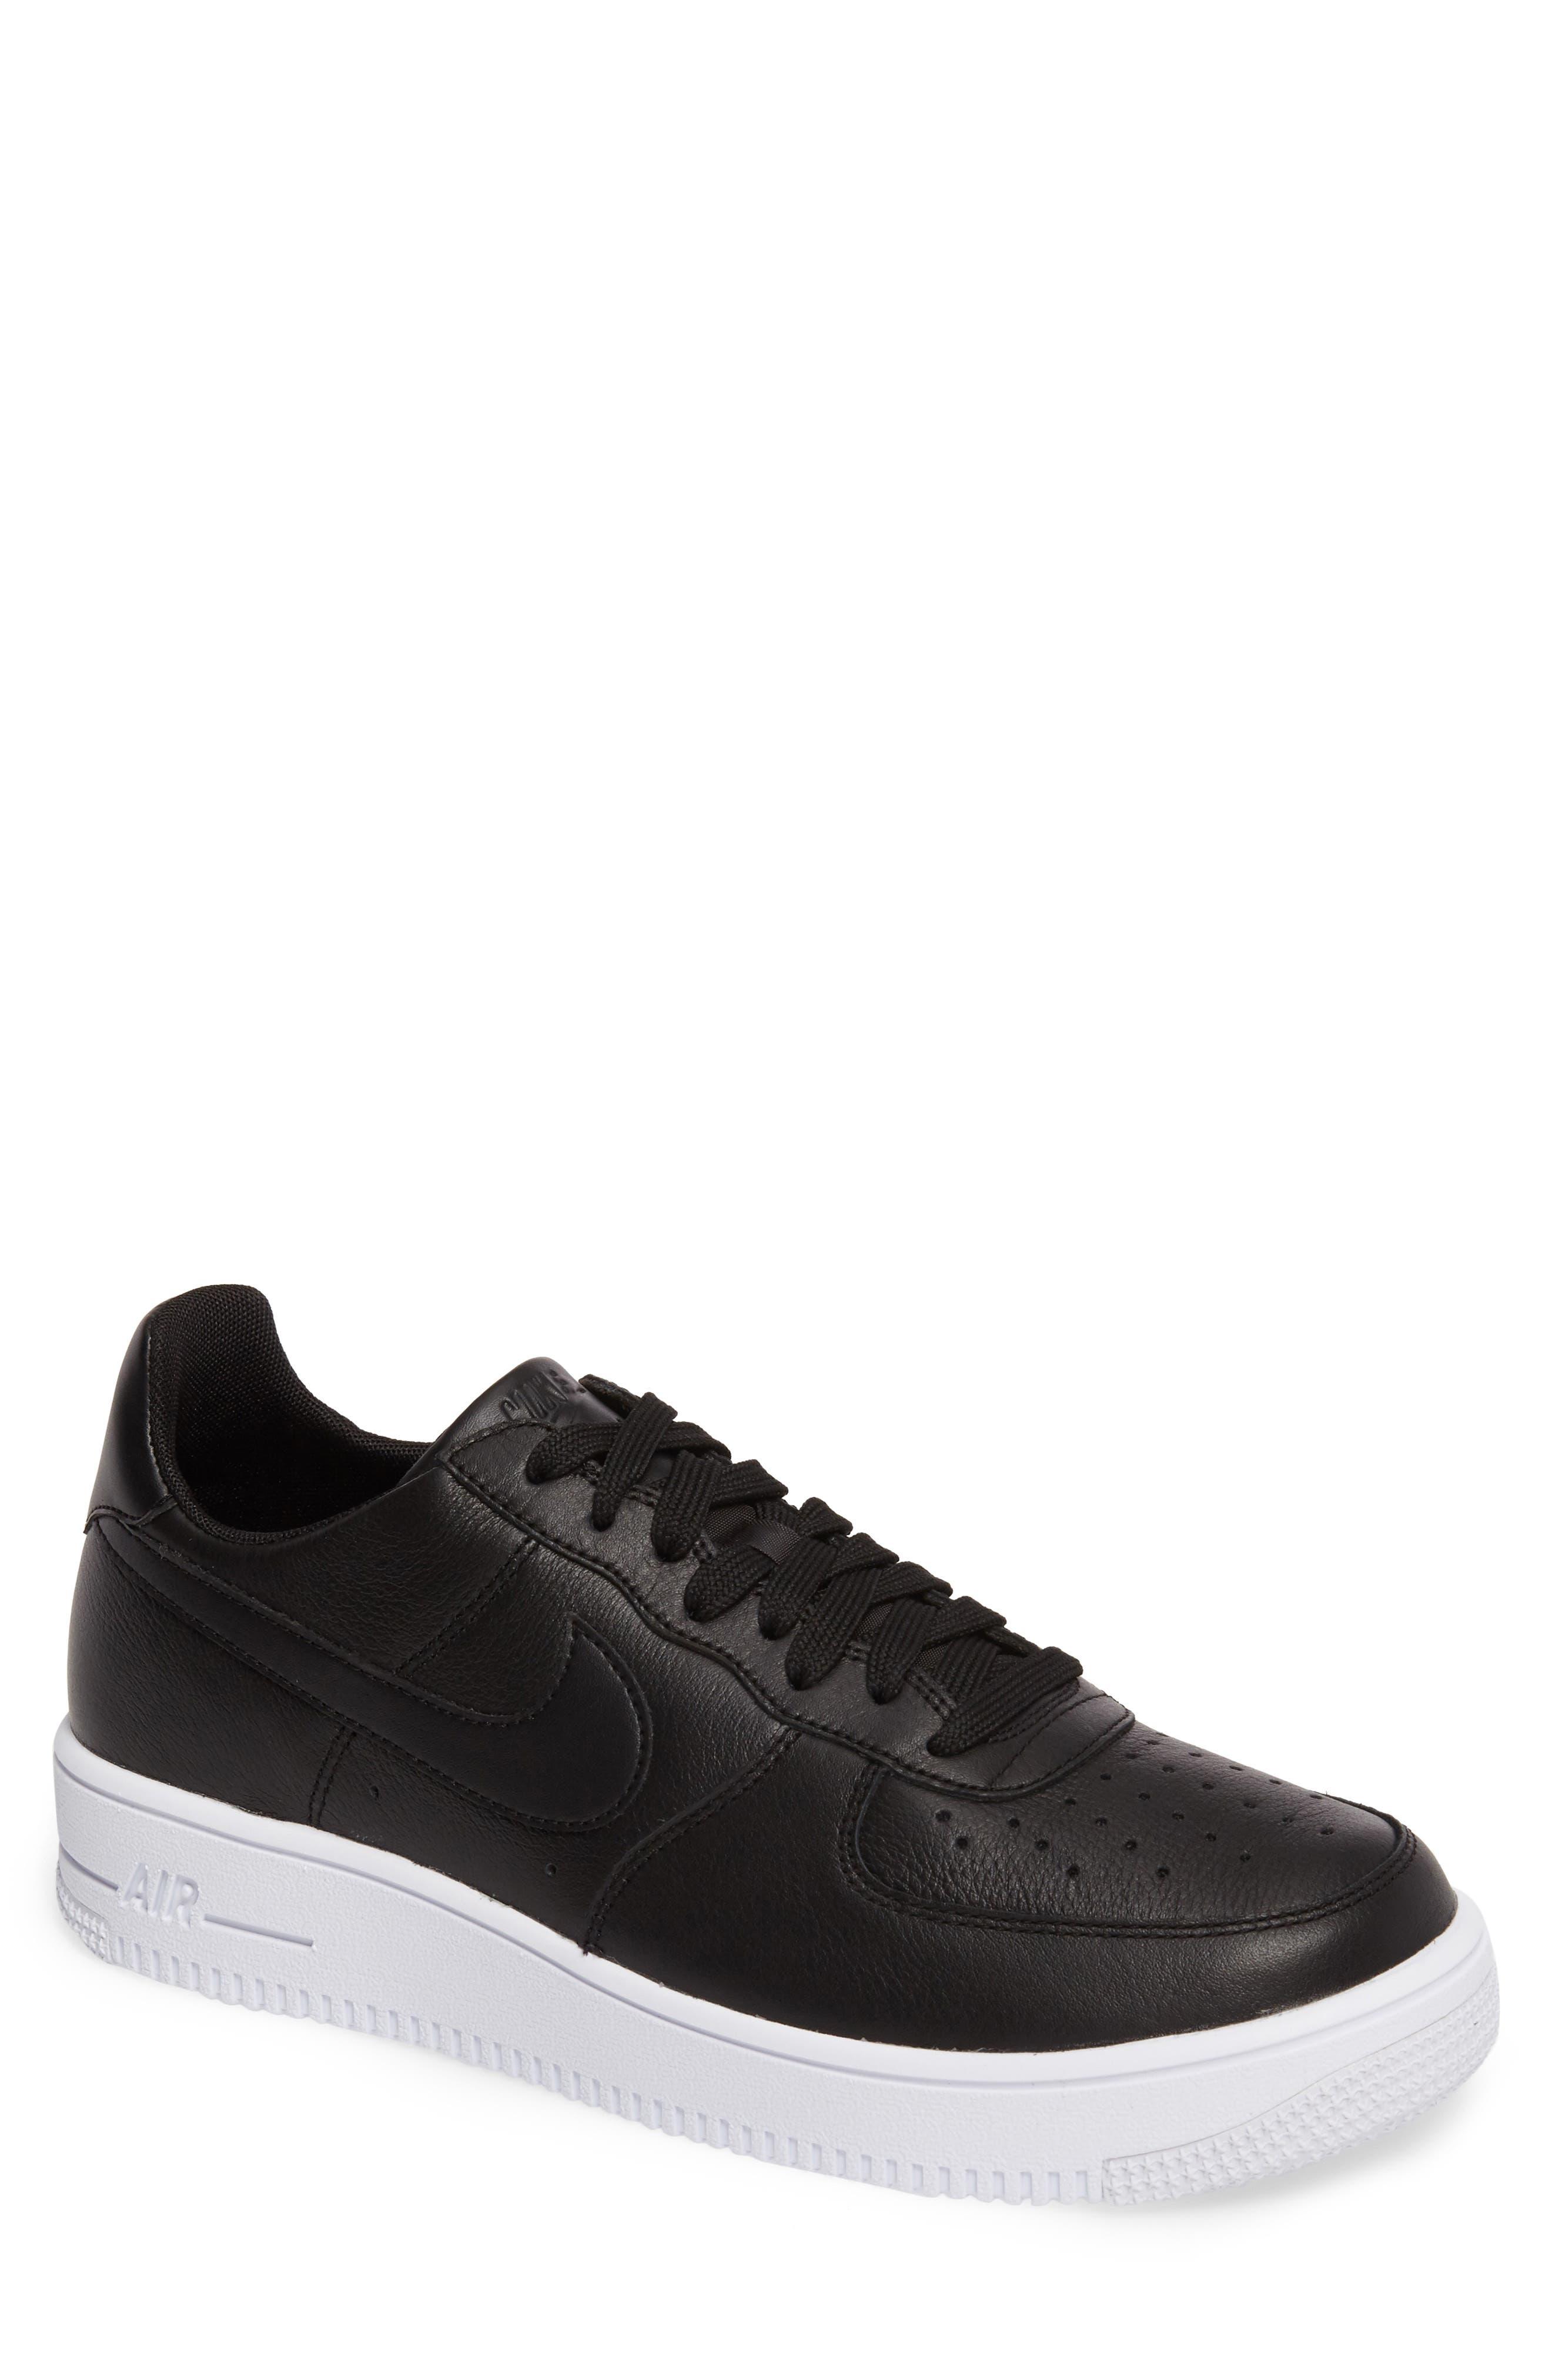 Air Force 1 Ultraforce Sneaker,                         Main,                         color, 003